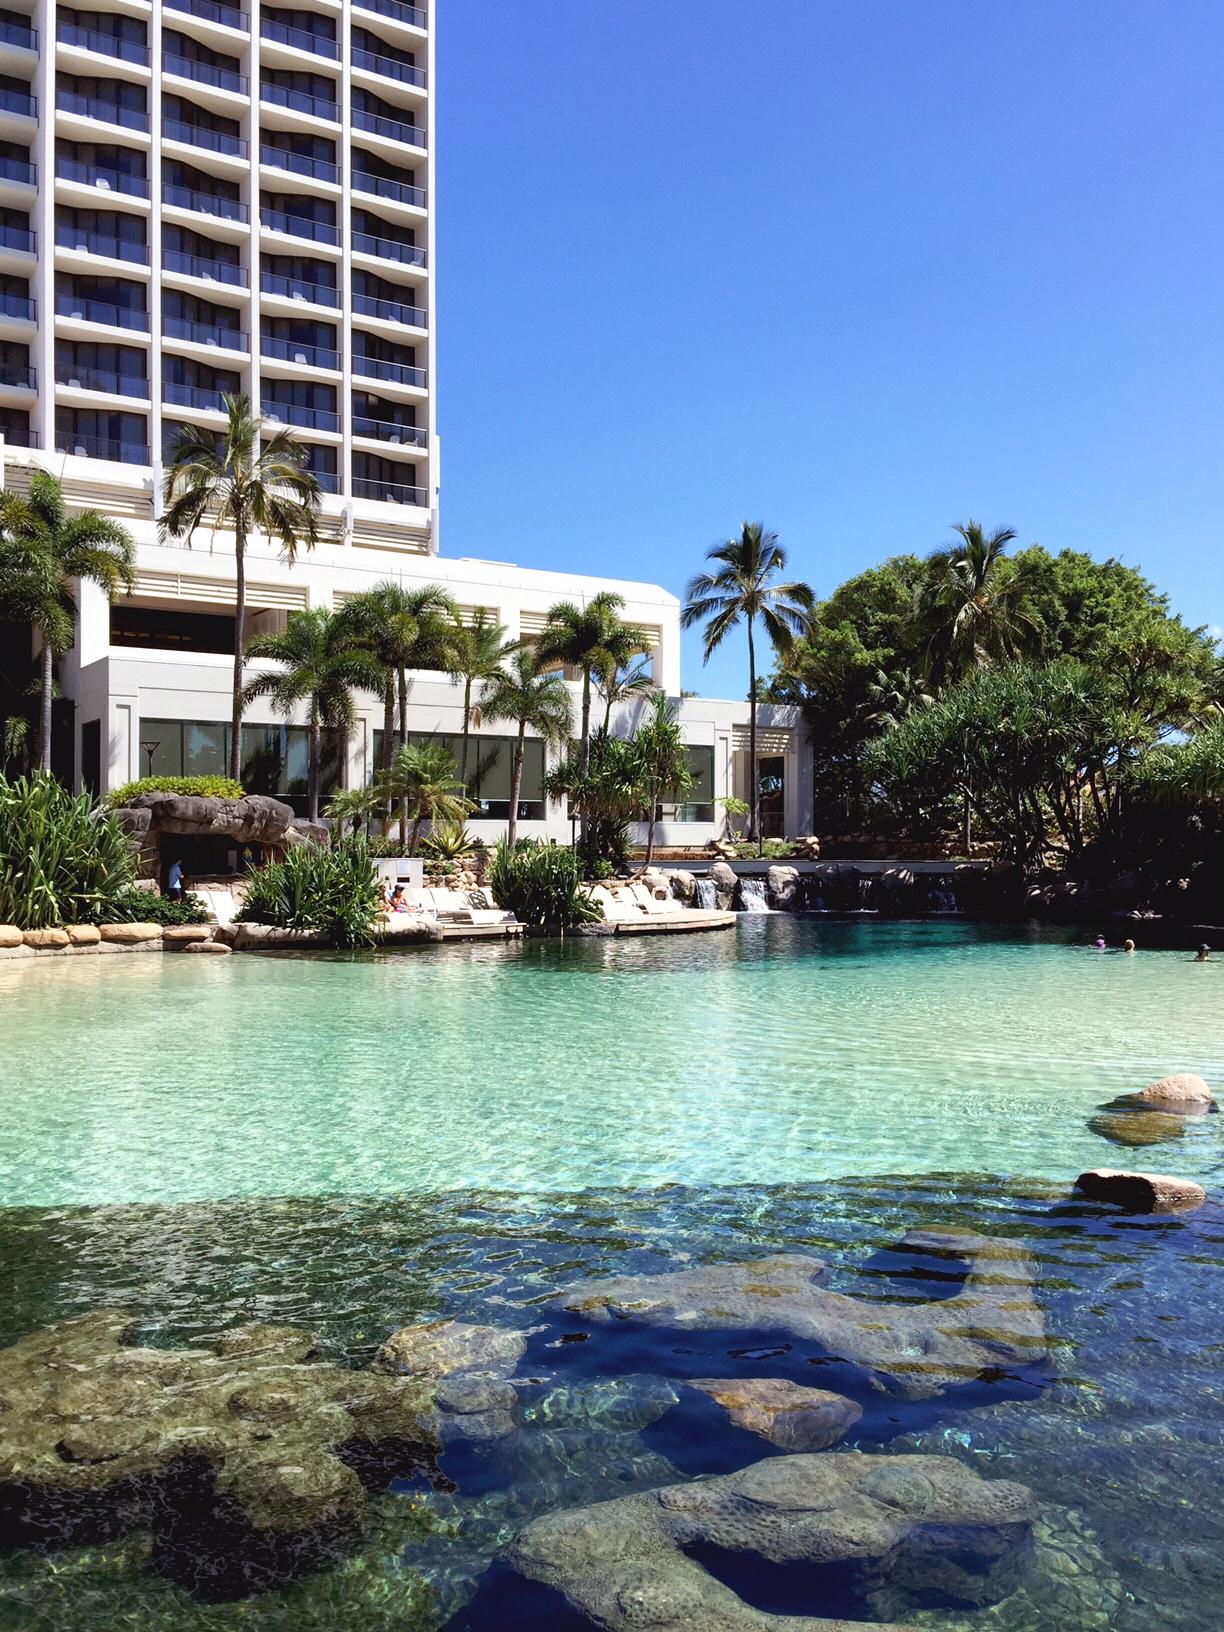 surfers paradise marriott resort and spa gold coast australia beach honeymoon romantic couples holiday luxury vacation hotel review lagoon resort pool snorkeling